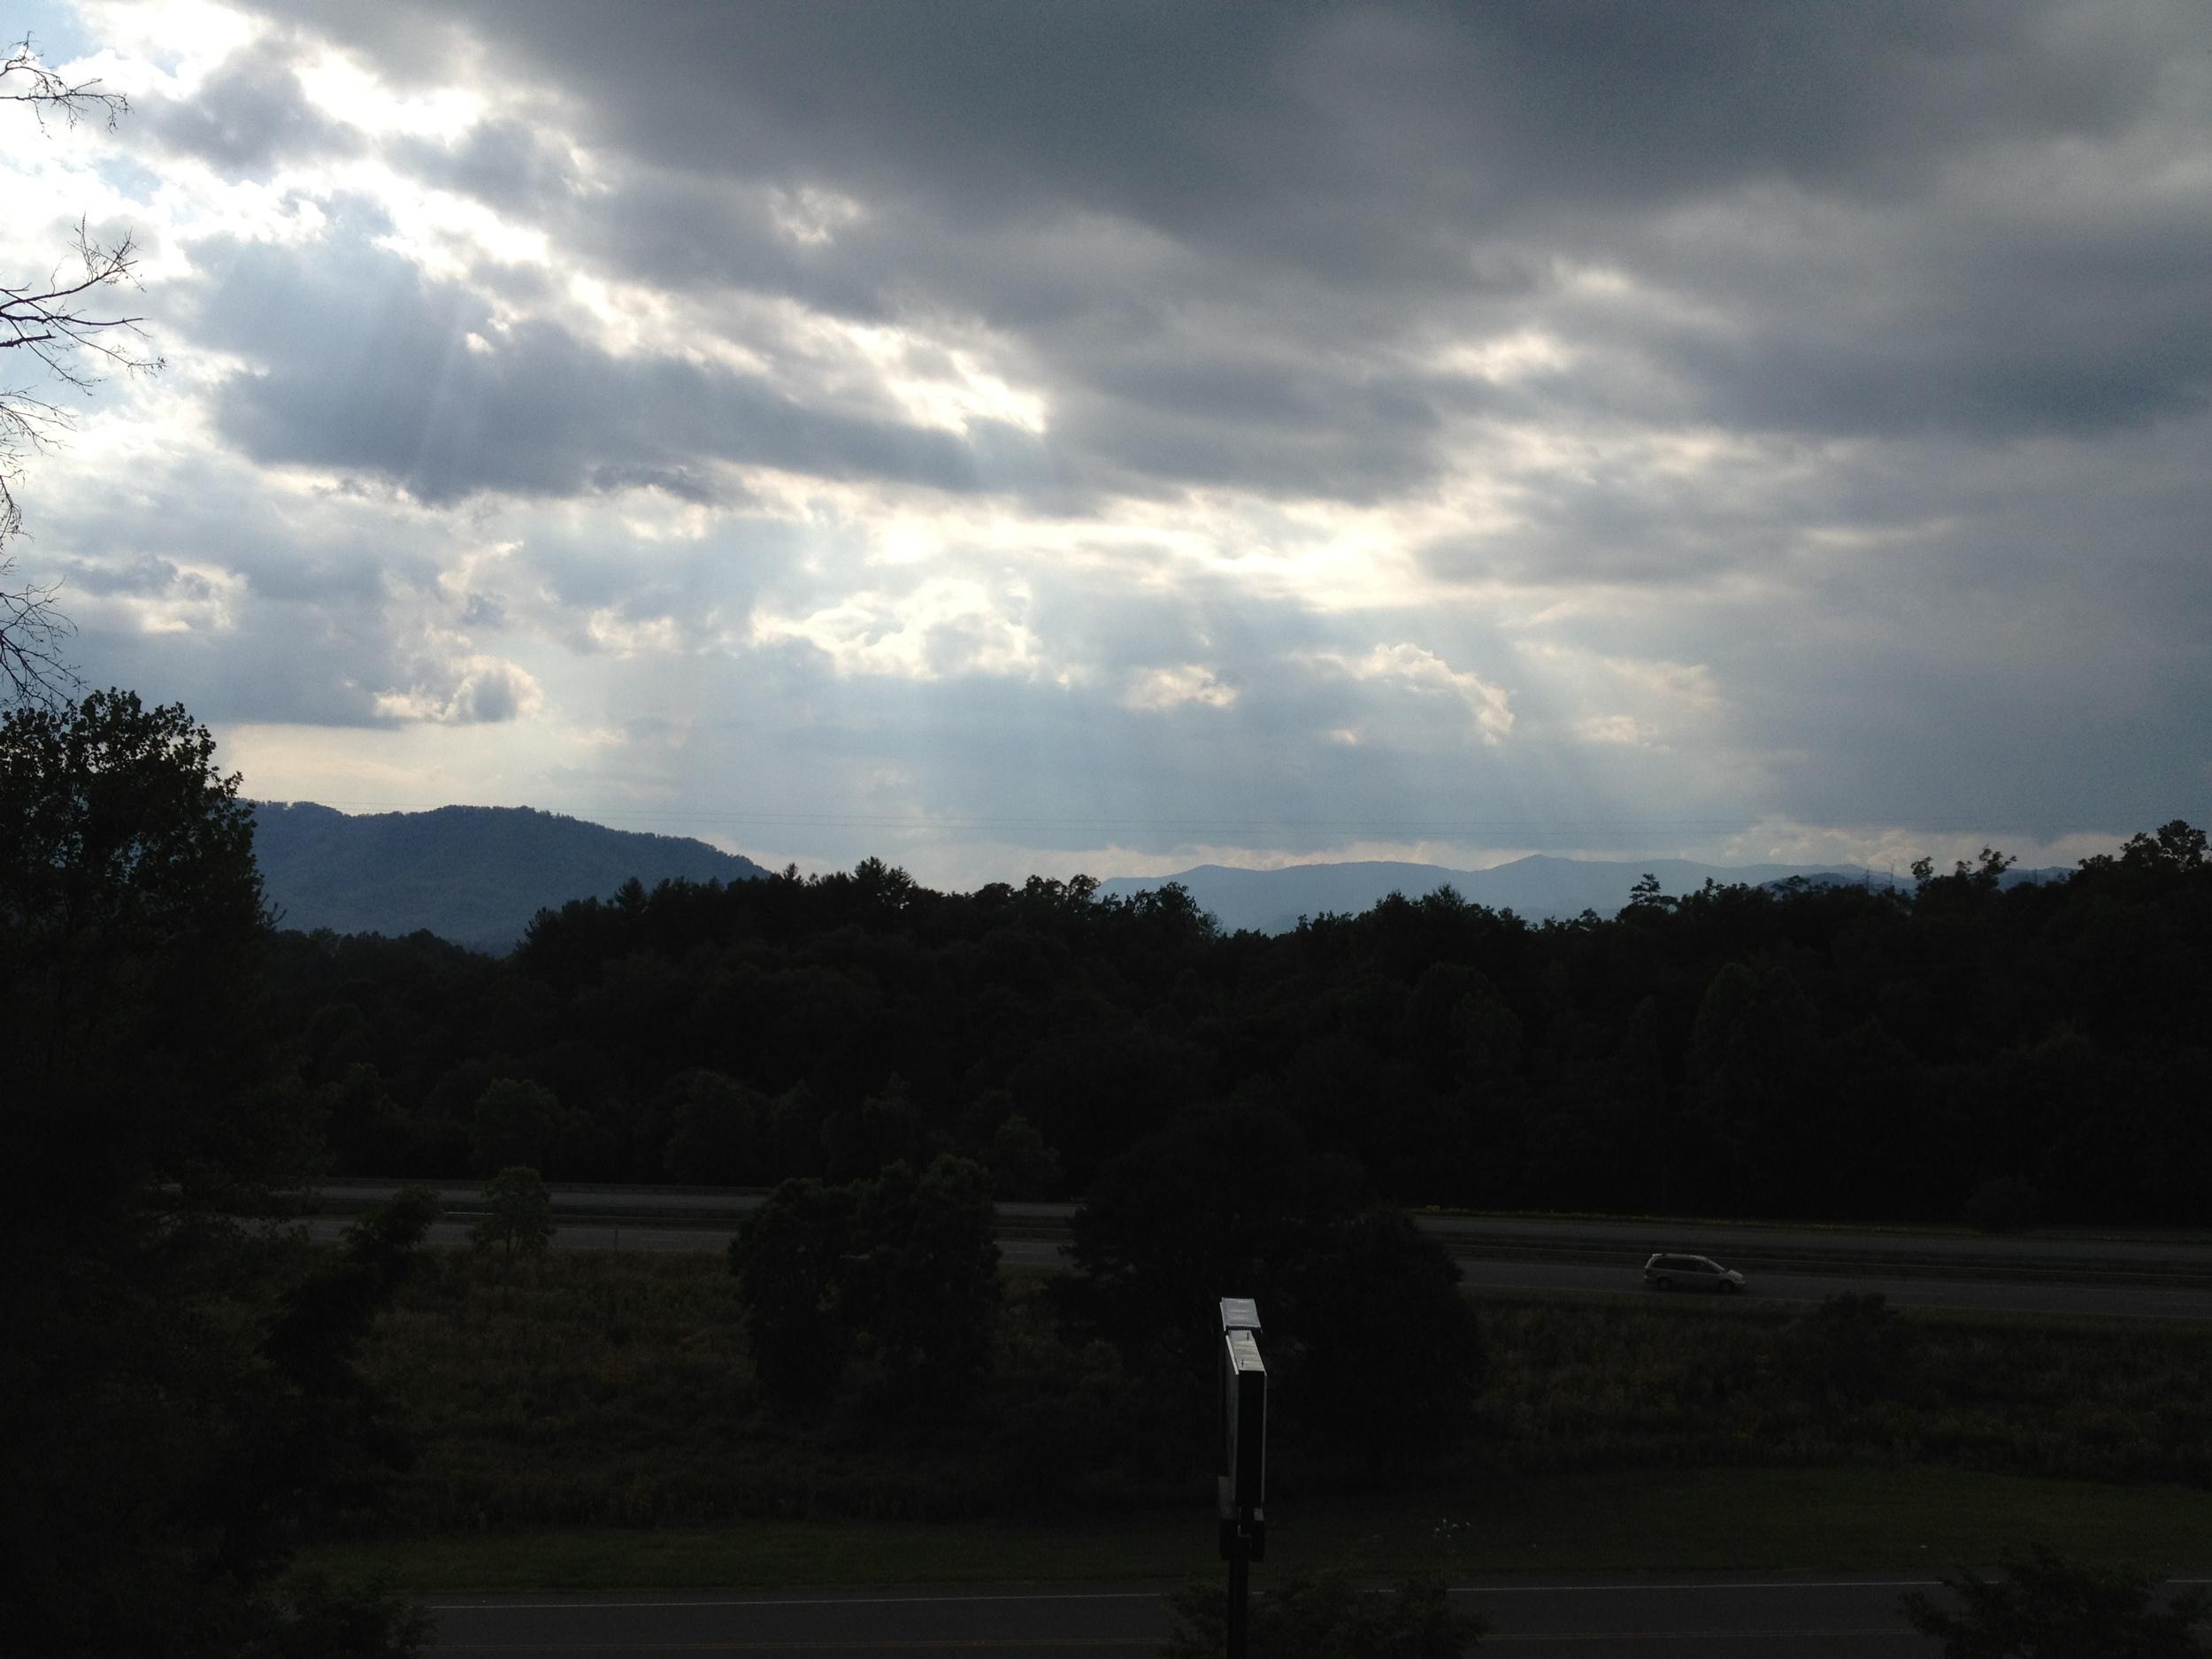 View from the Sleep Inn Bryson City, NC